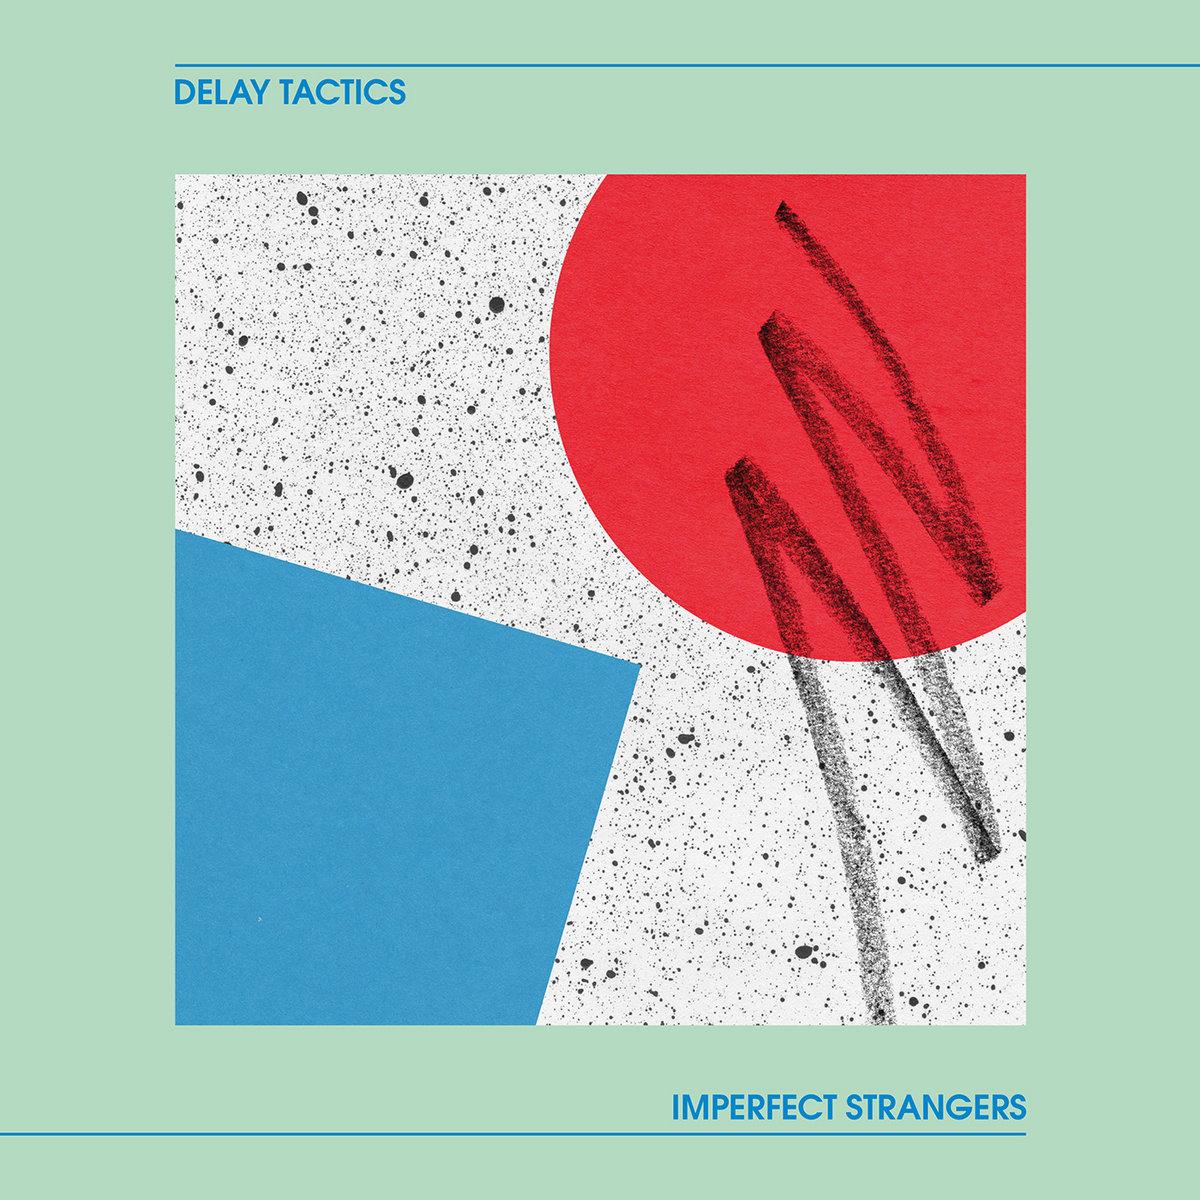 Delay Tactics Imperfect Strangers